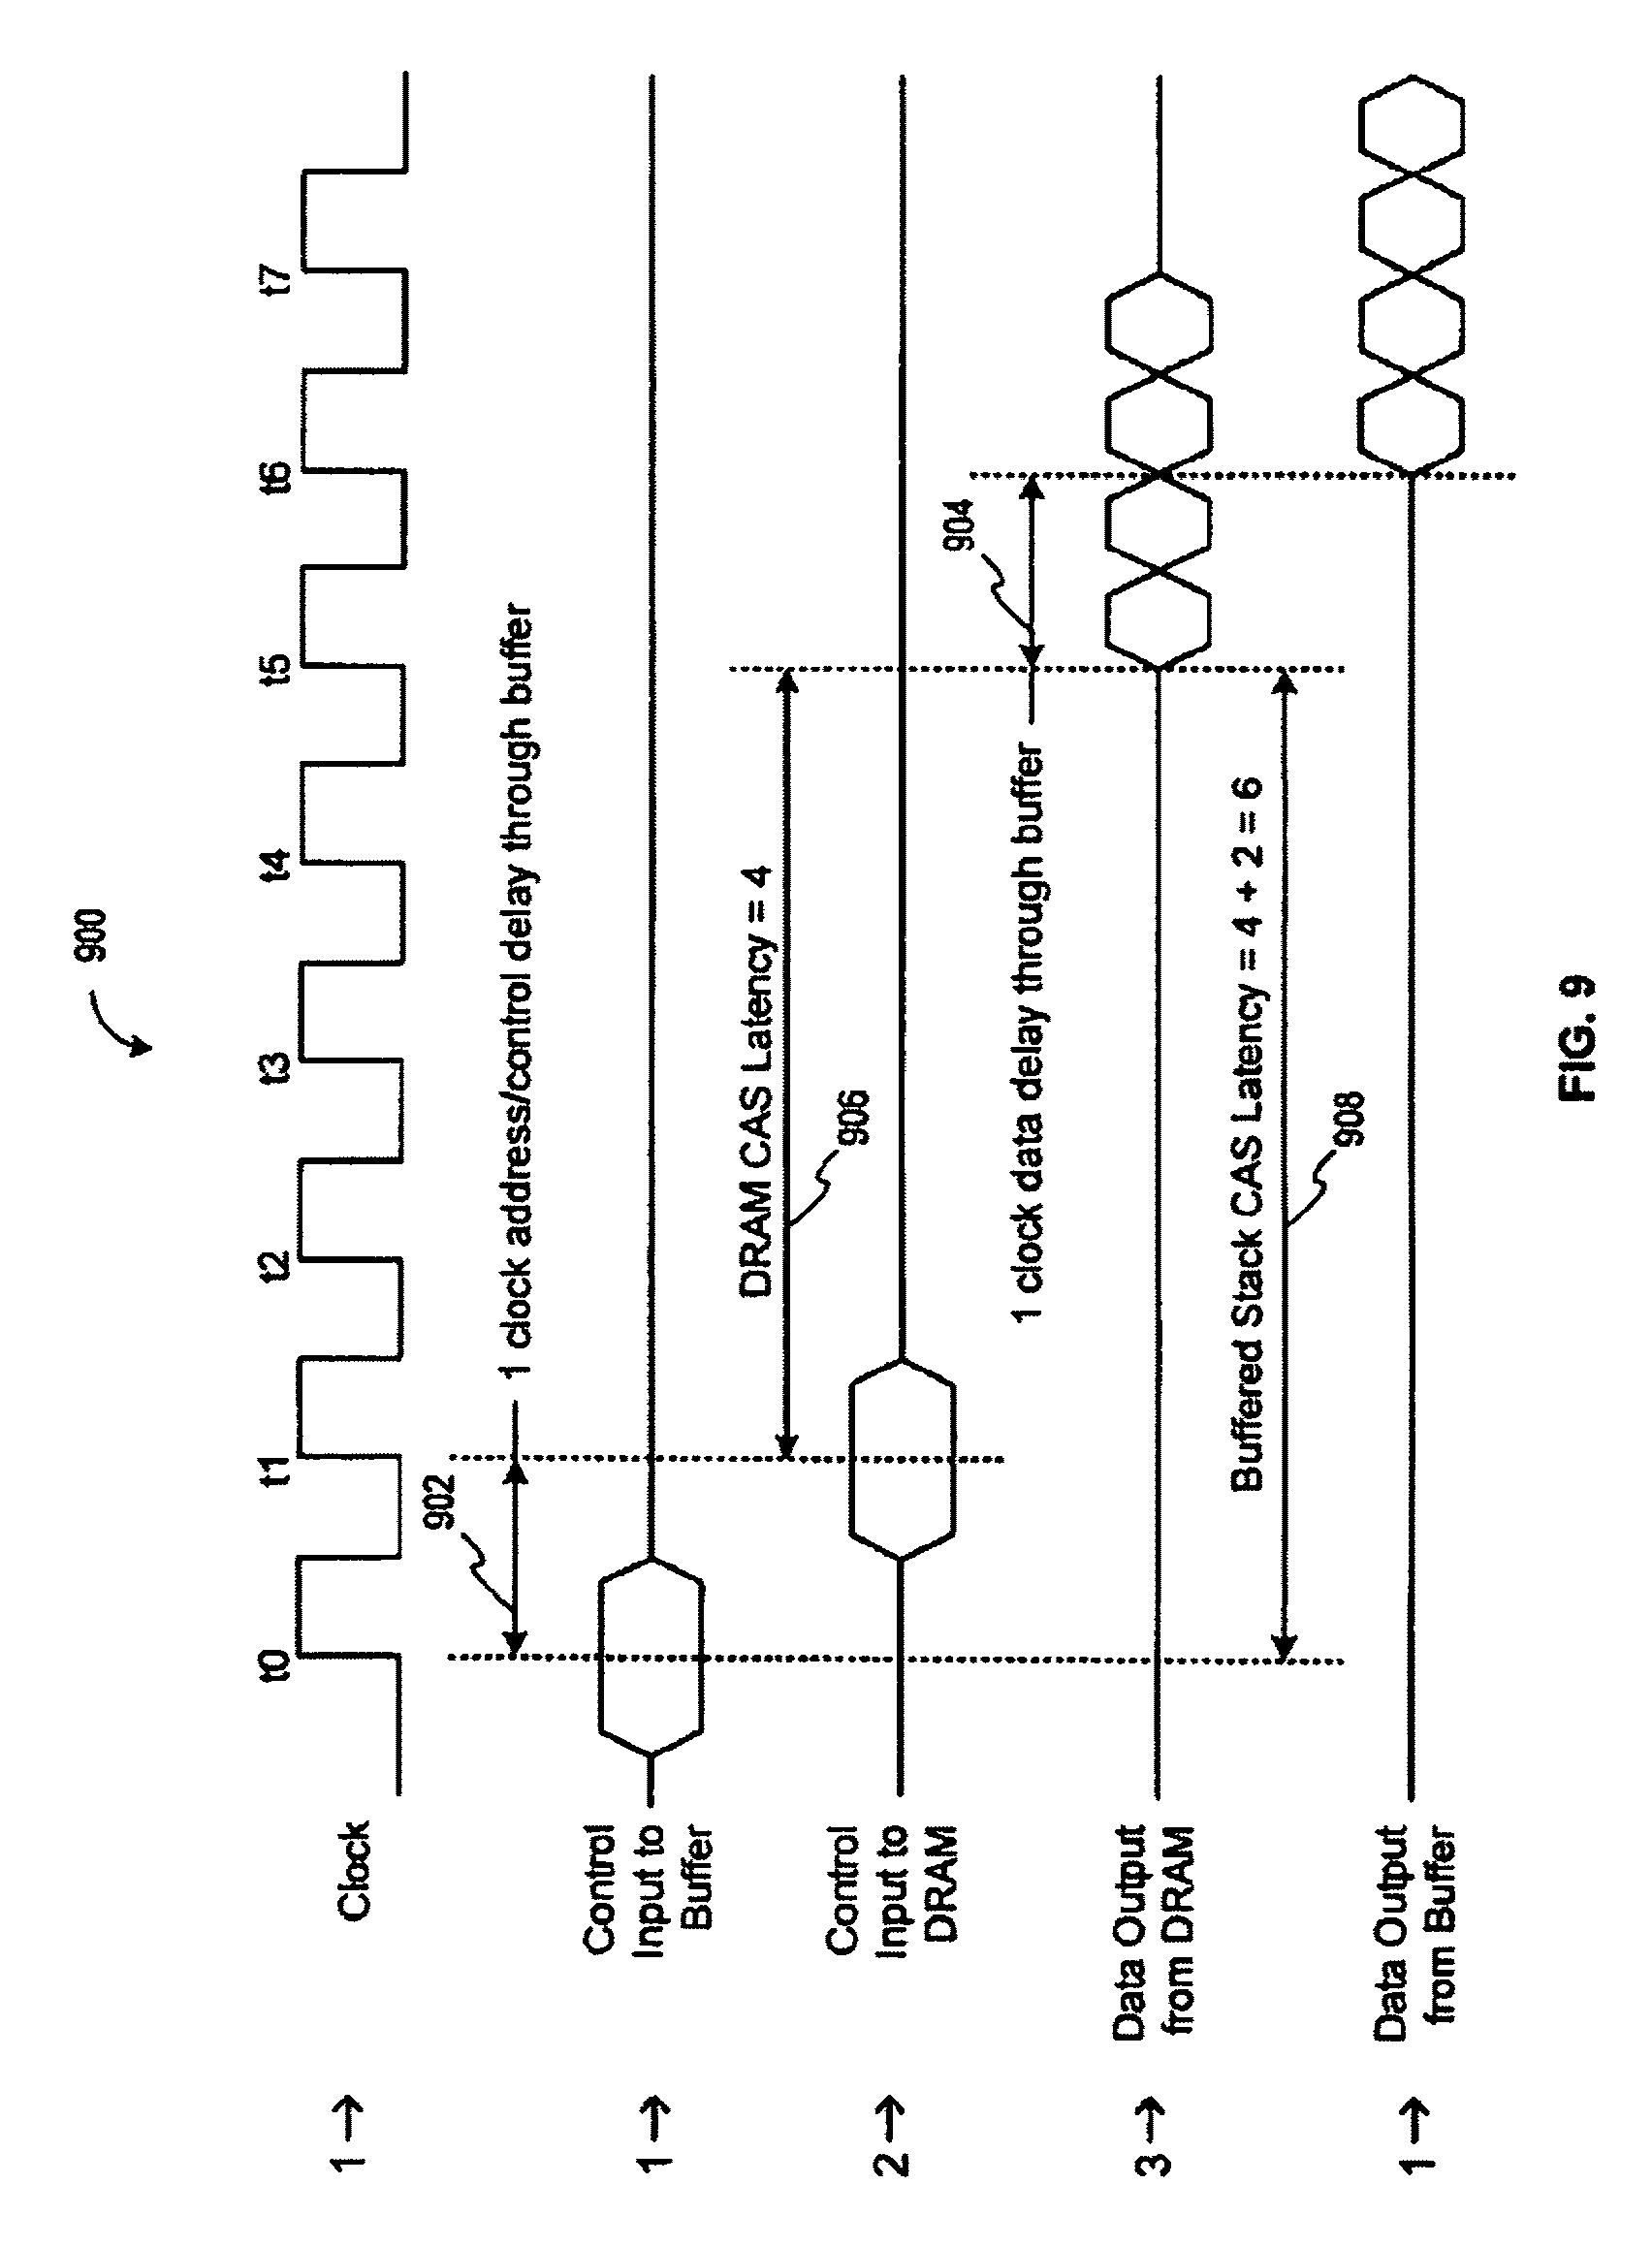 Patent US 9,171,585 B2